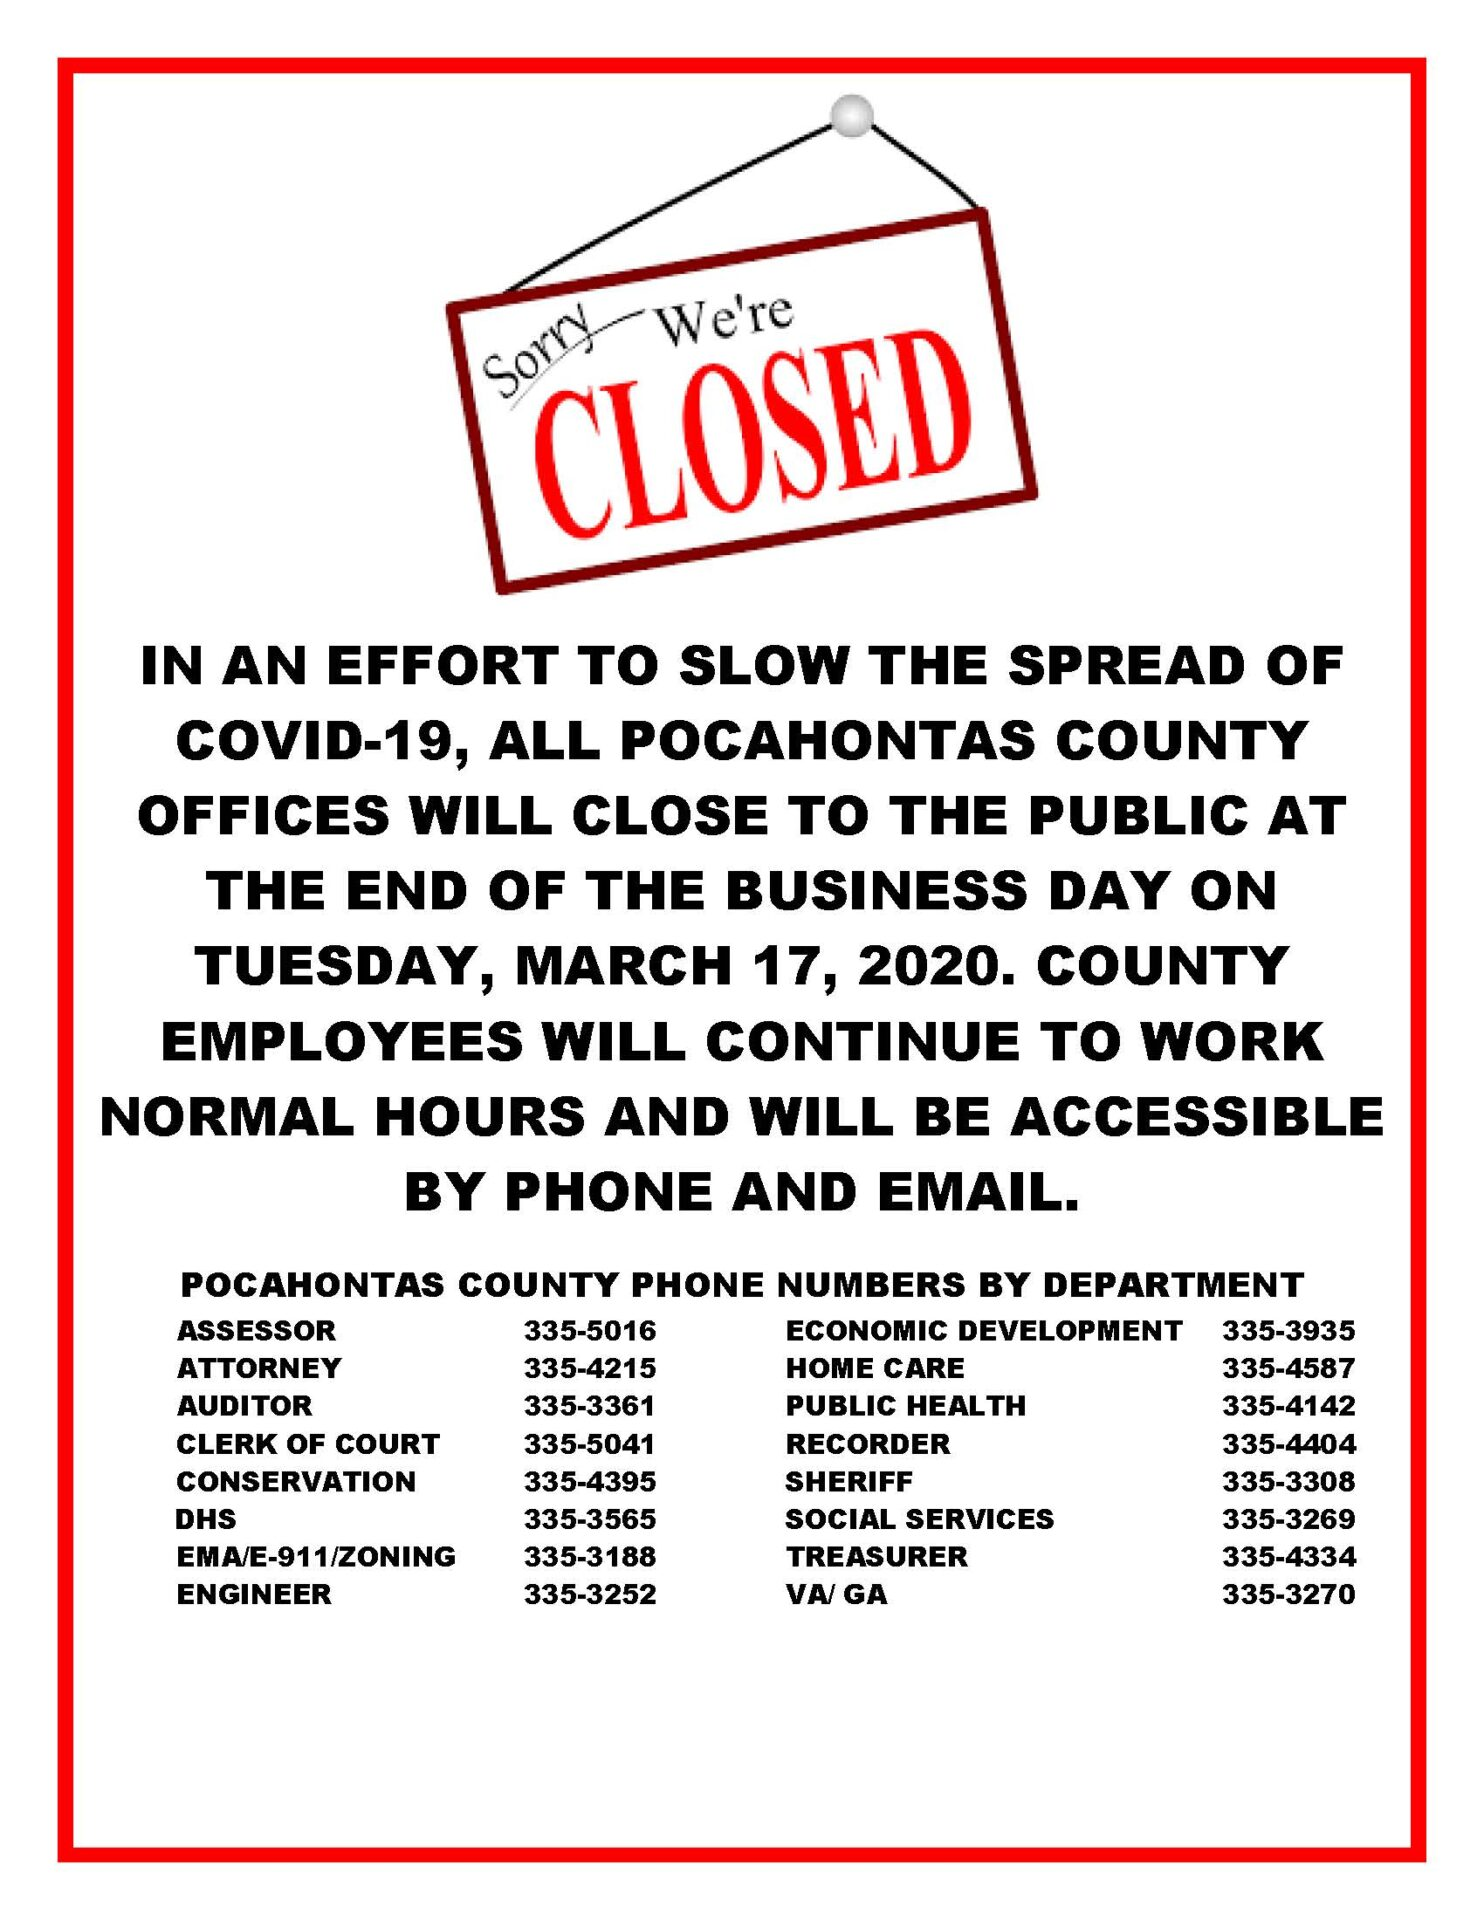 All County Bld closedv2